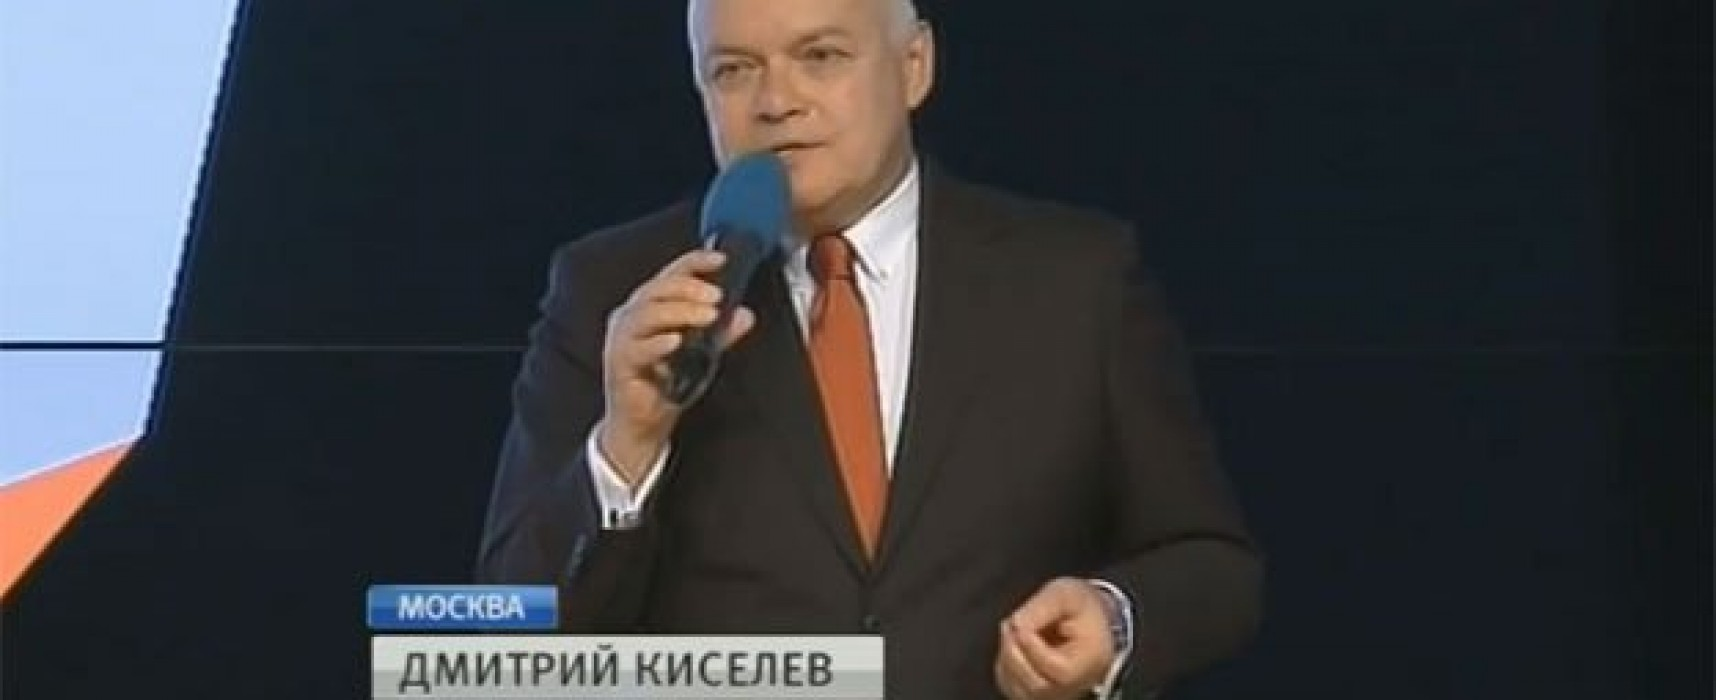 Russia's global media operation under the spotlight